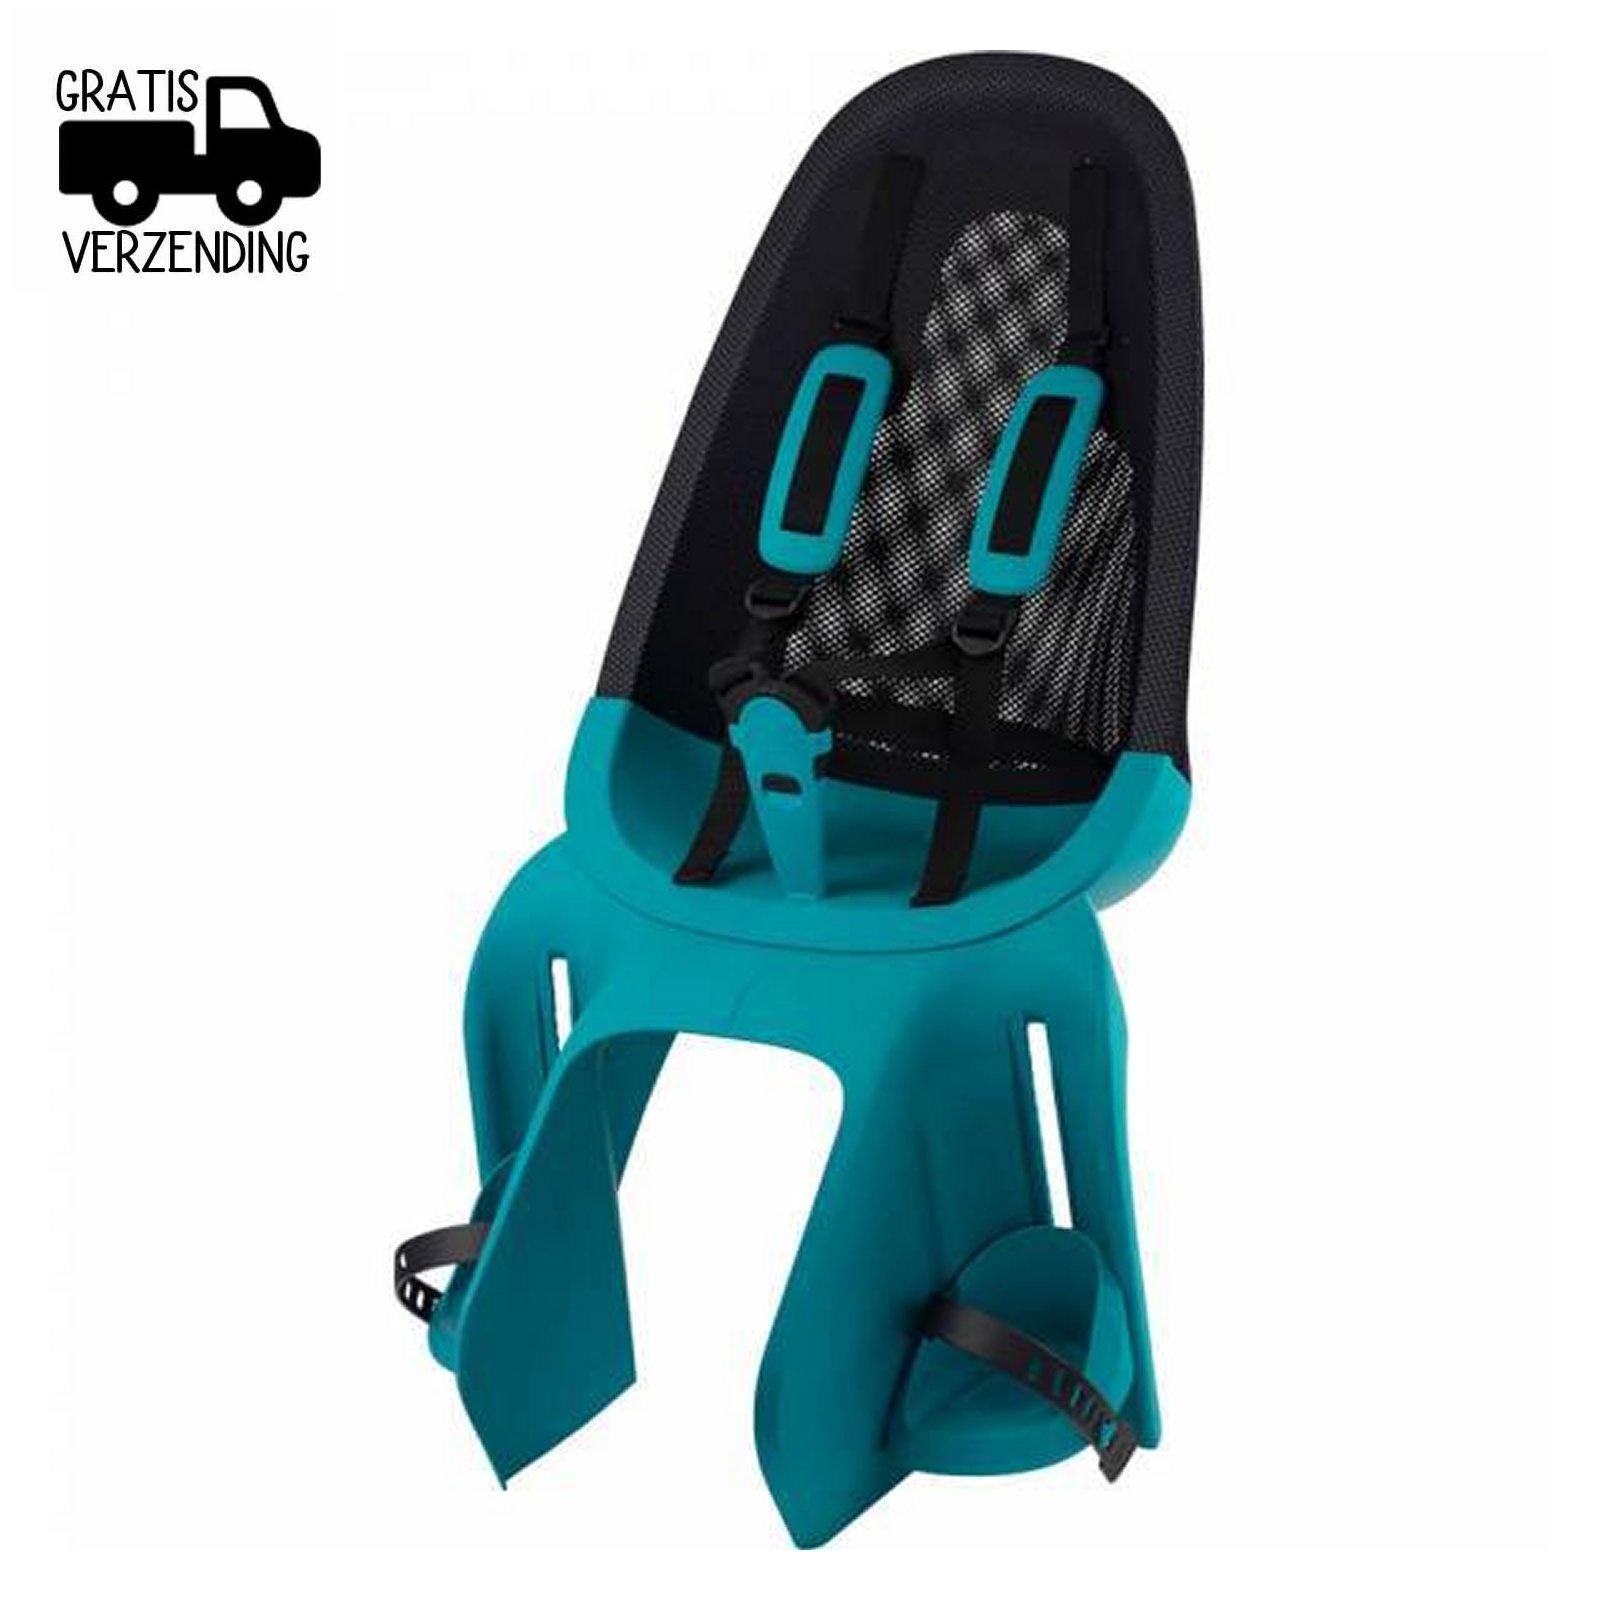 Air achterstoeltje drager bevestiging turquoise